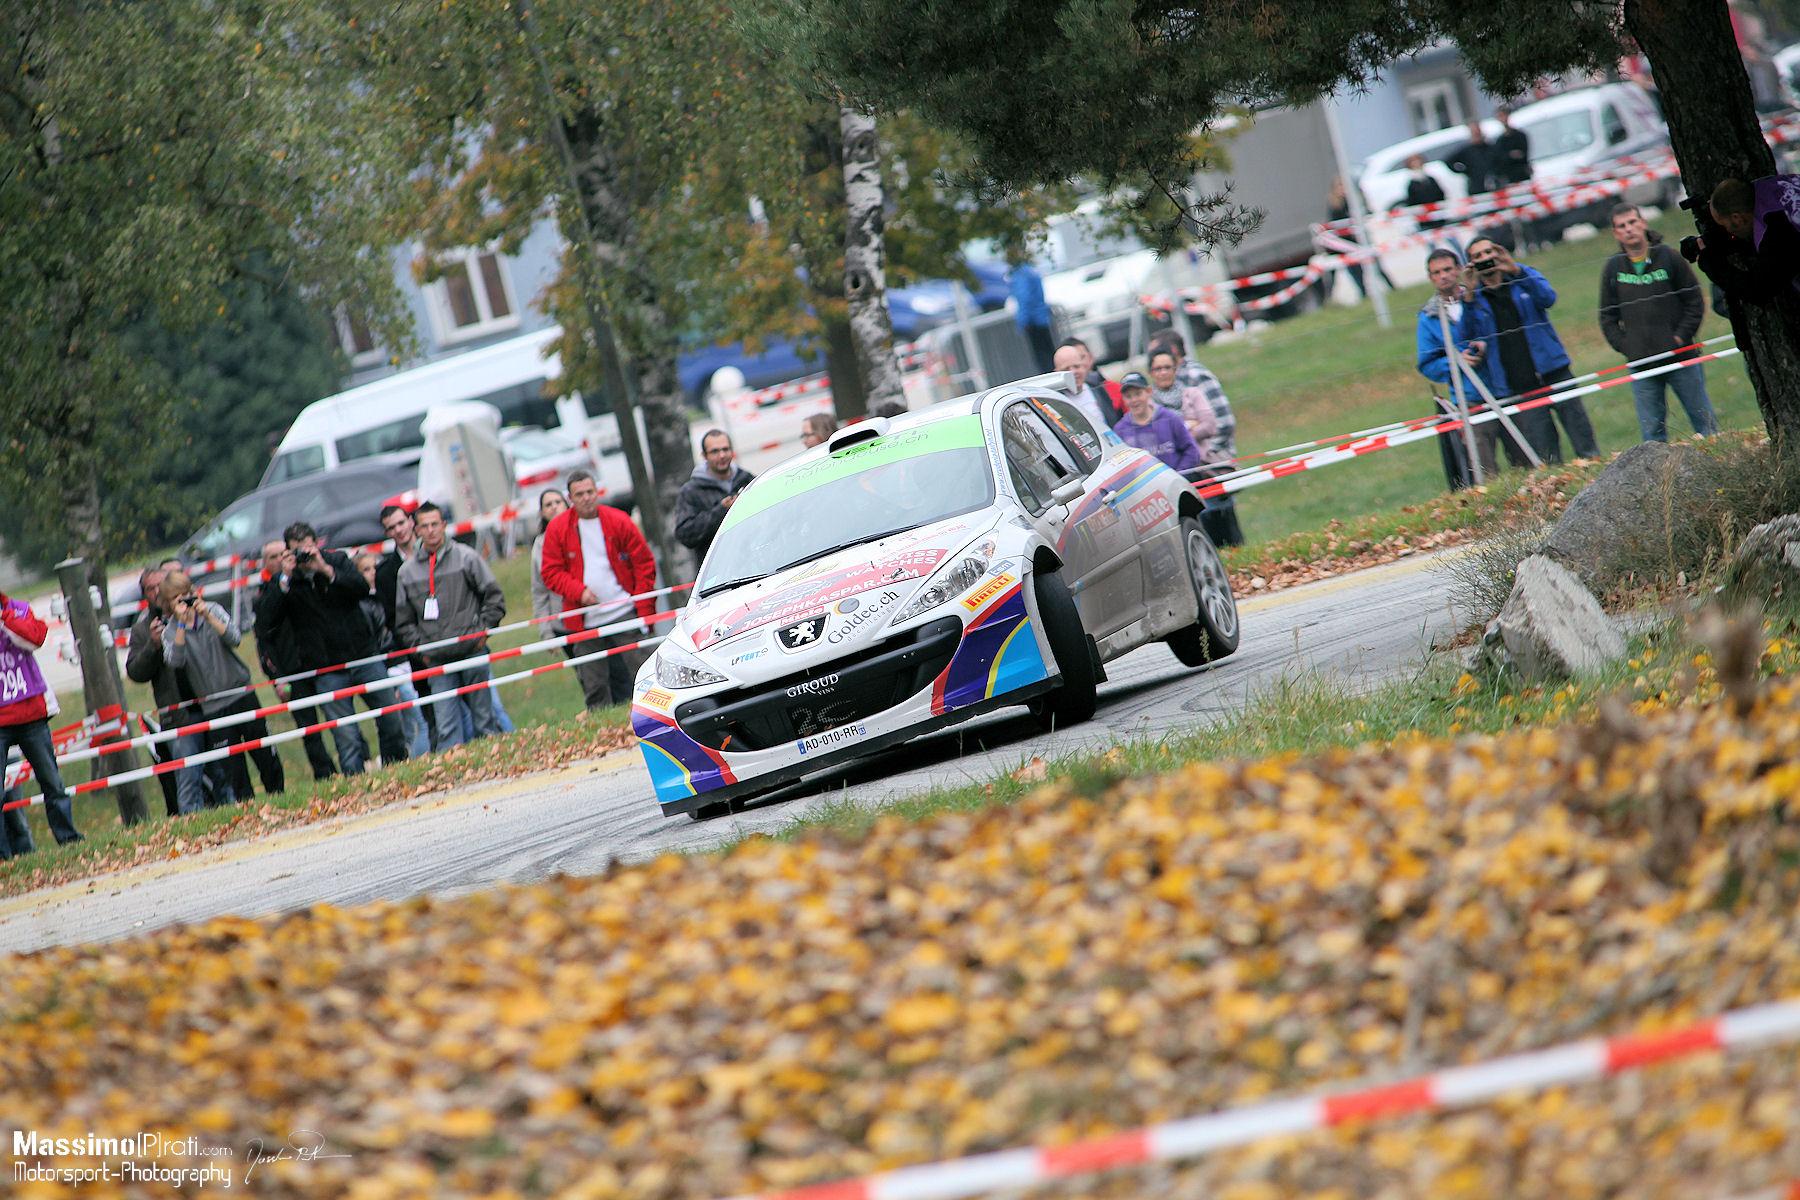 1er : Reuche Laurent - Deriaz Jean (Peugeot 207 S2000)